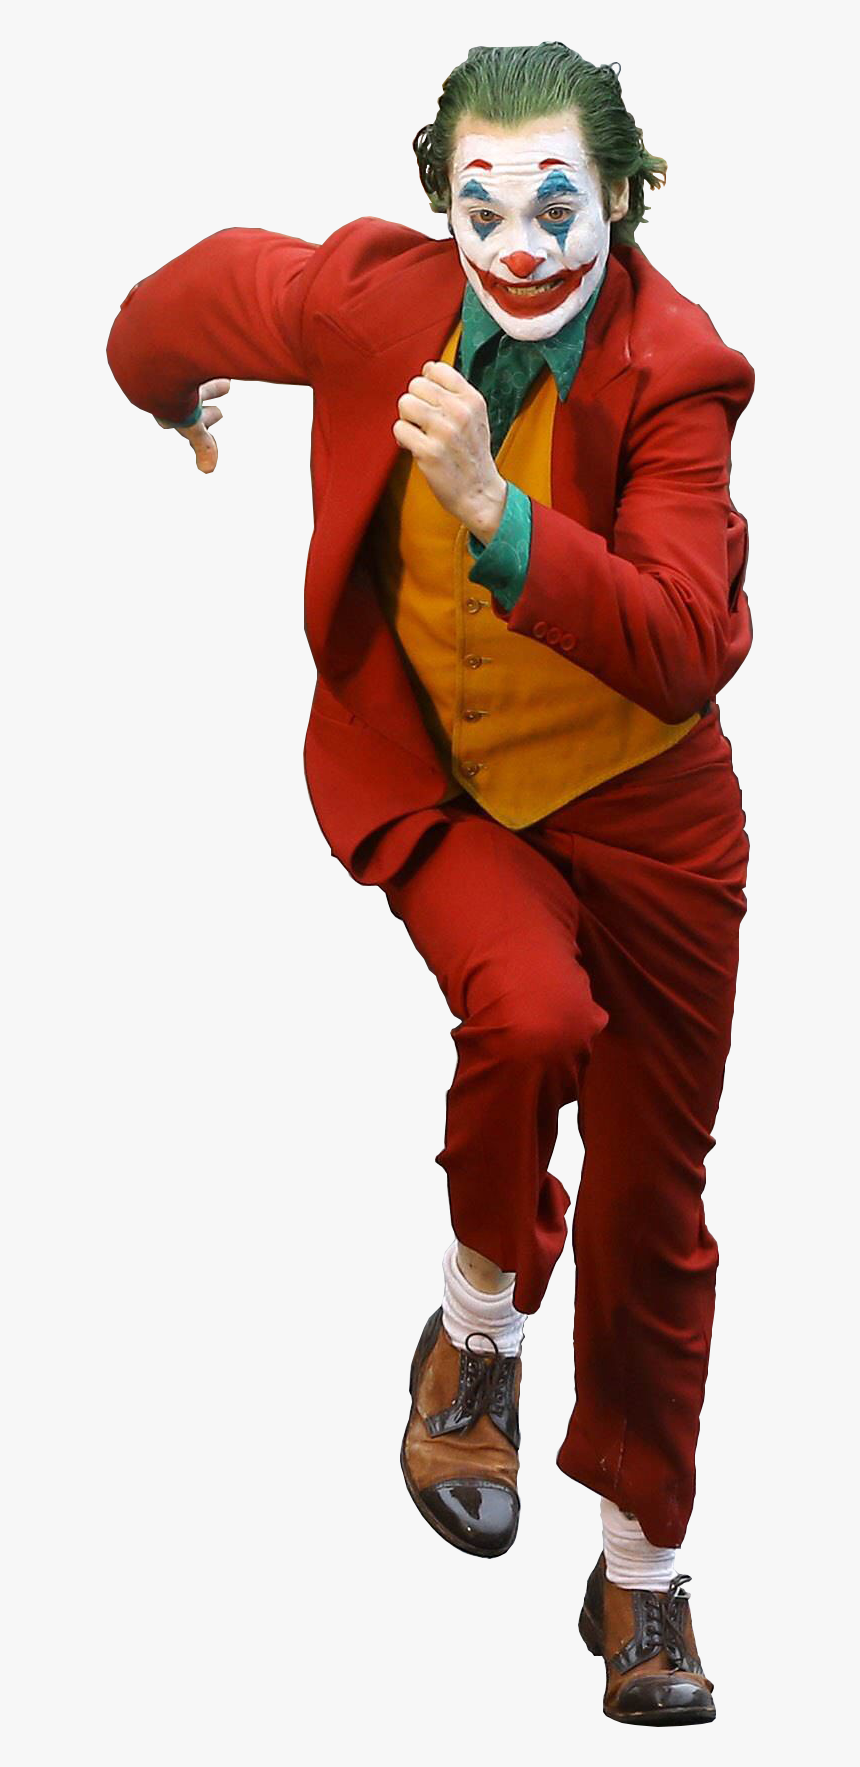 Joaquin Phoenix Joker Png Transparent Png Transparent Png Image Pngitem Joker png cliparts, all these png images has no background, free & unlimited downloads. joaquin phoenix joker png transparent